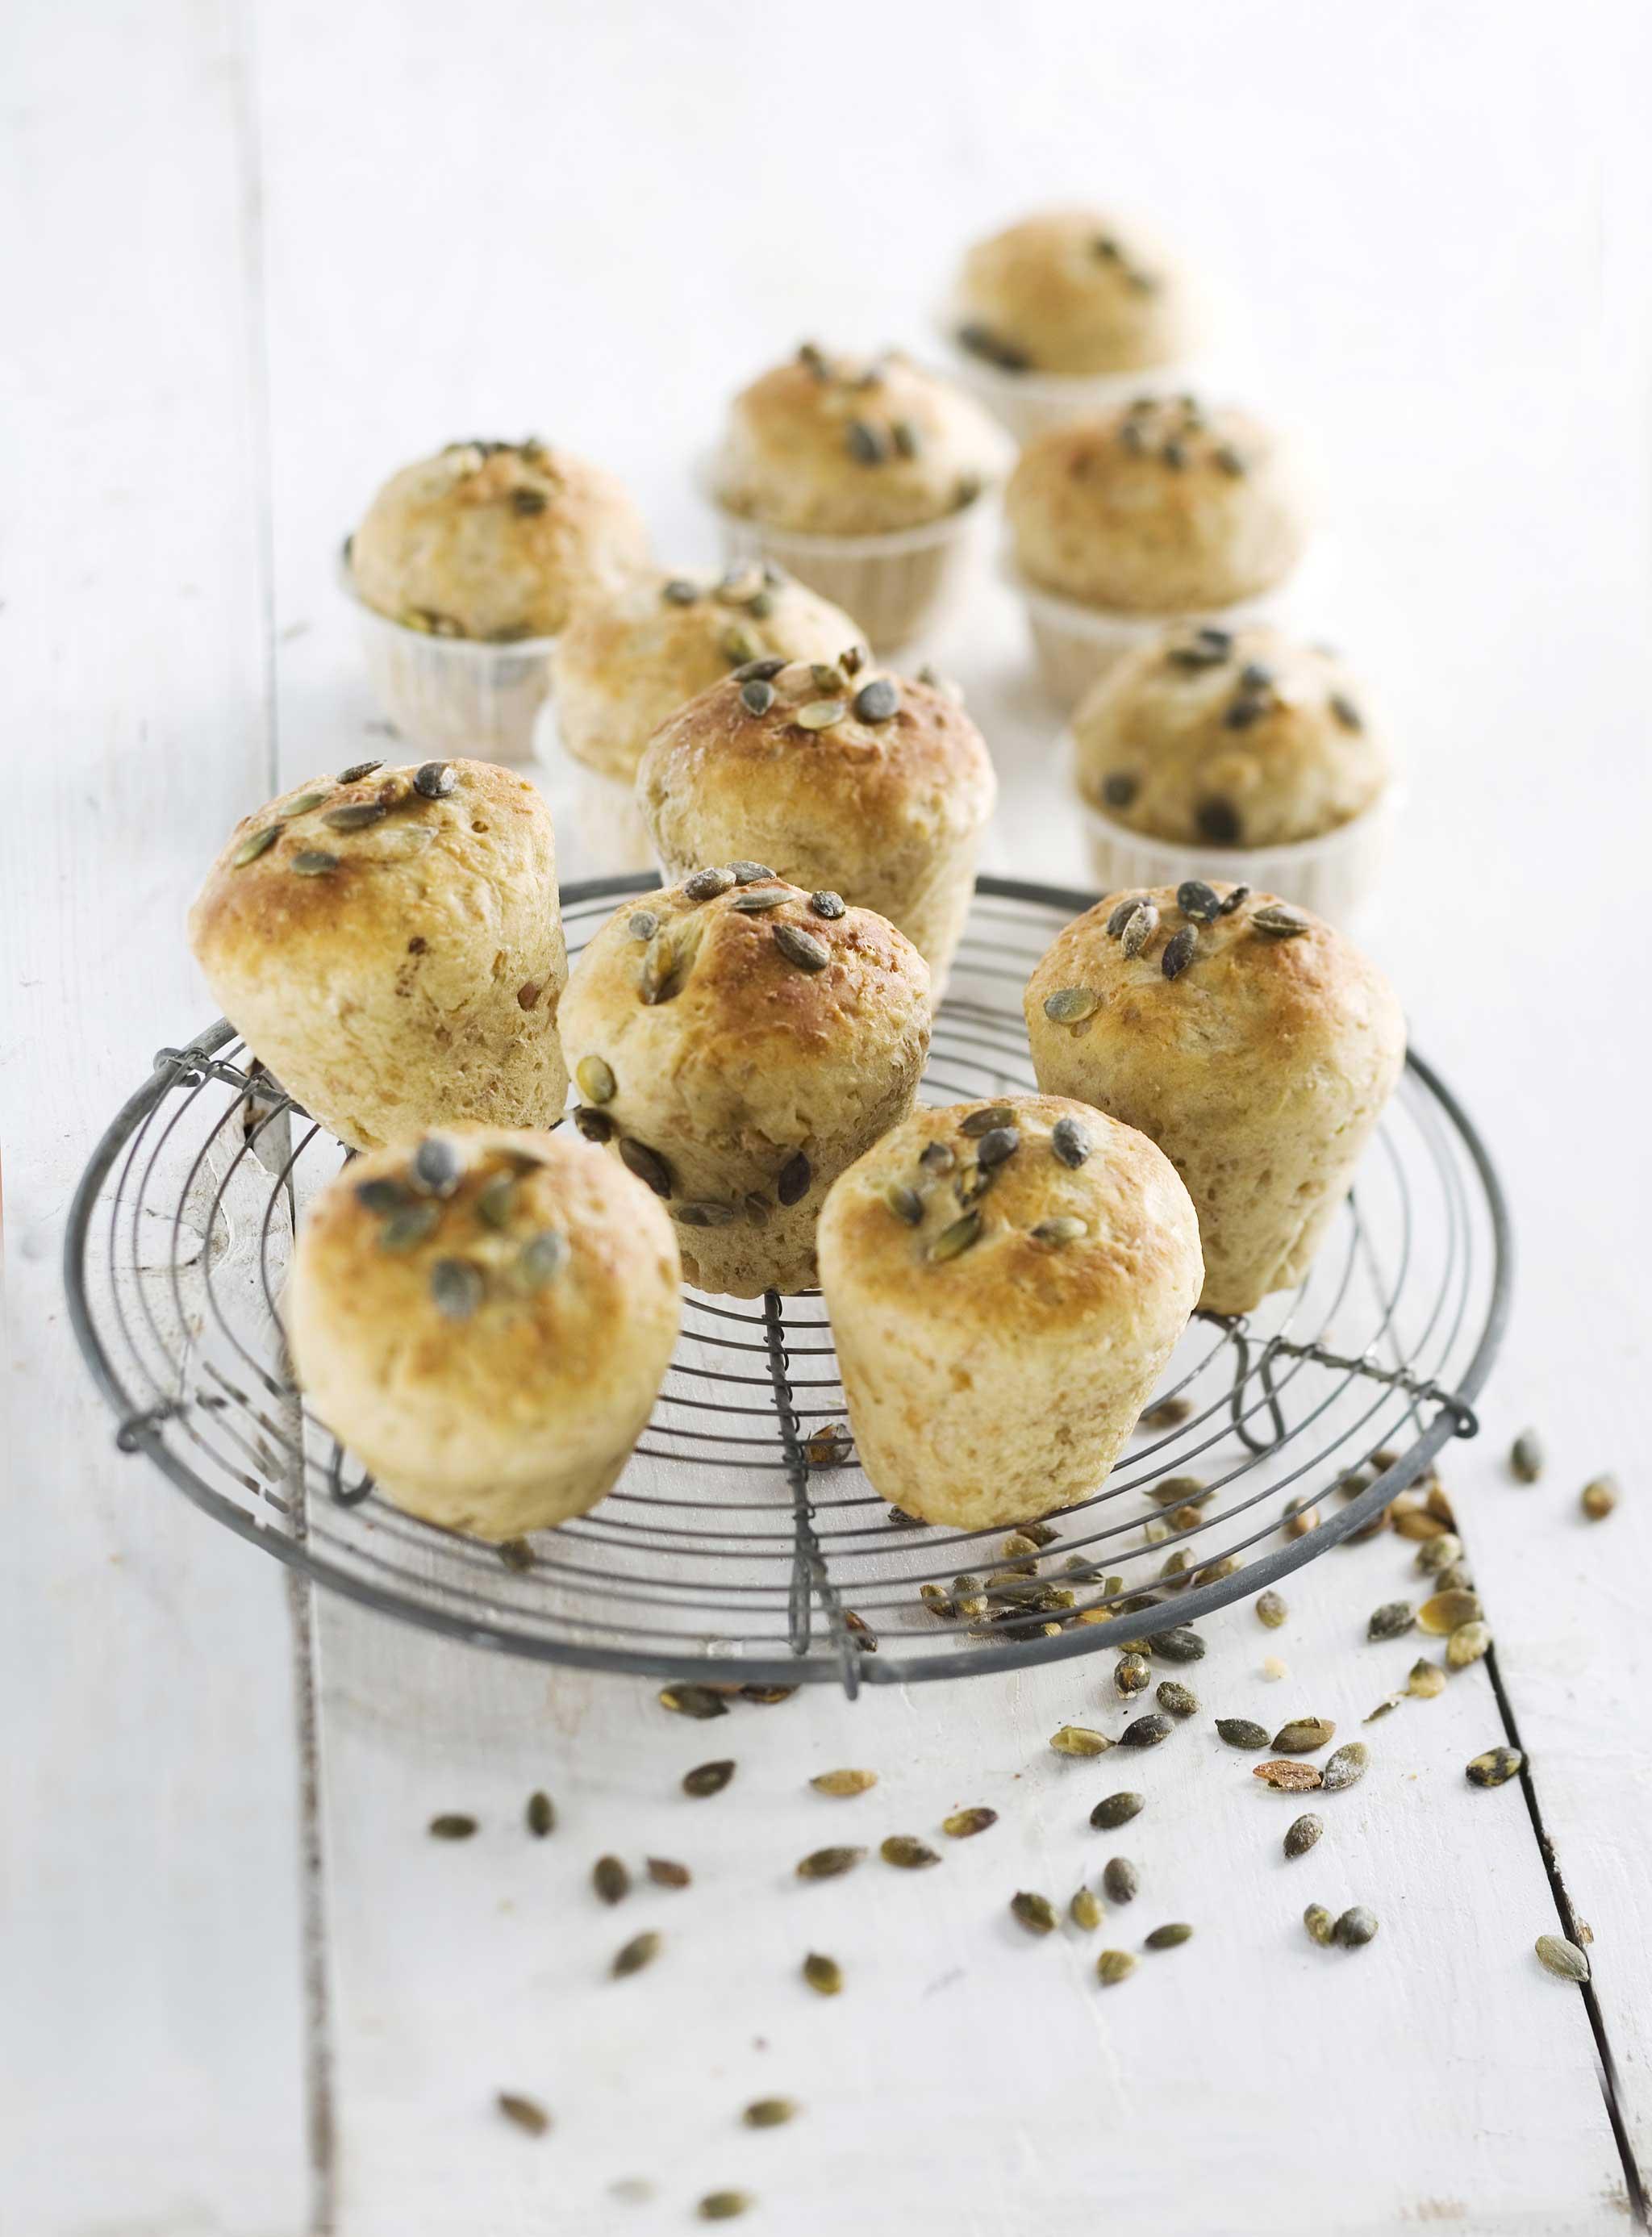 733956-muffinit.jpg